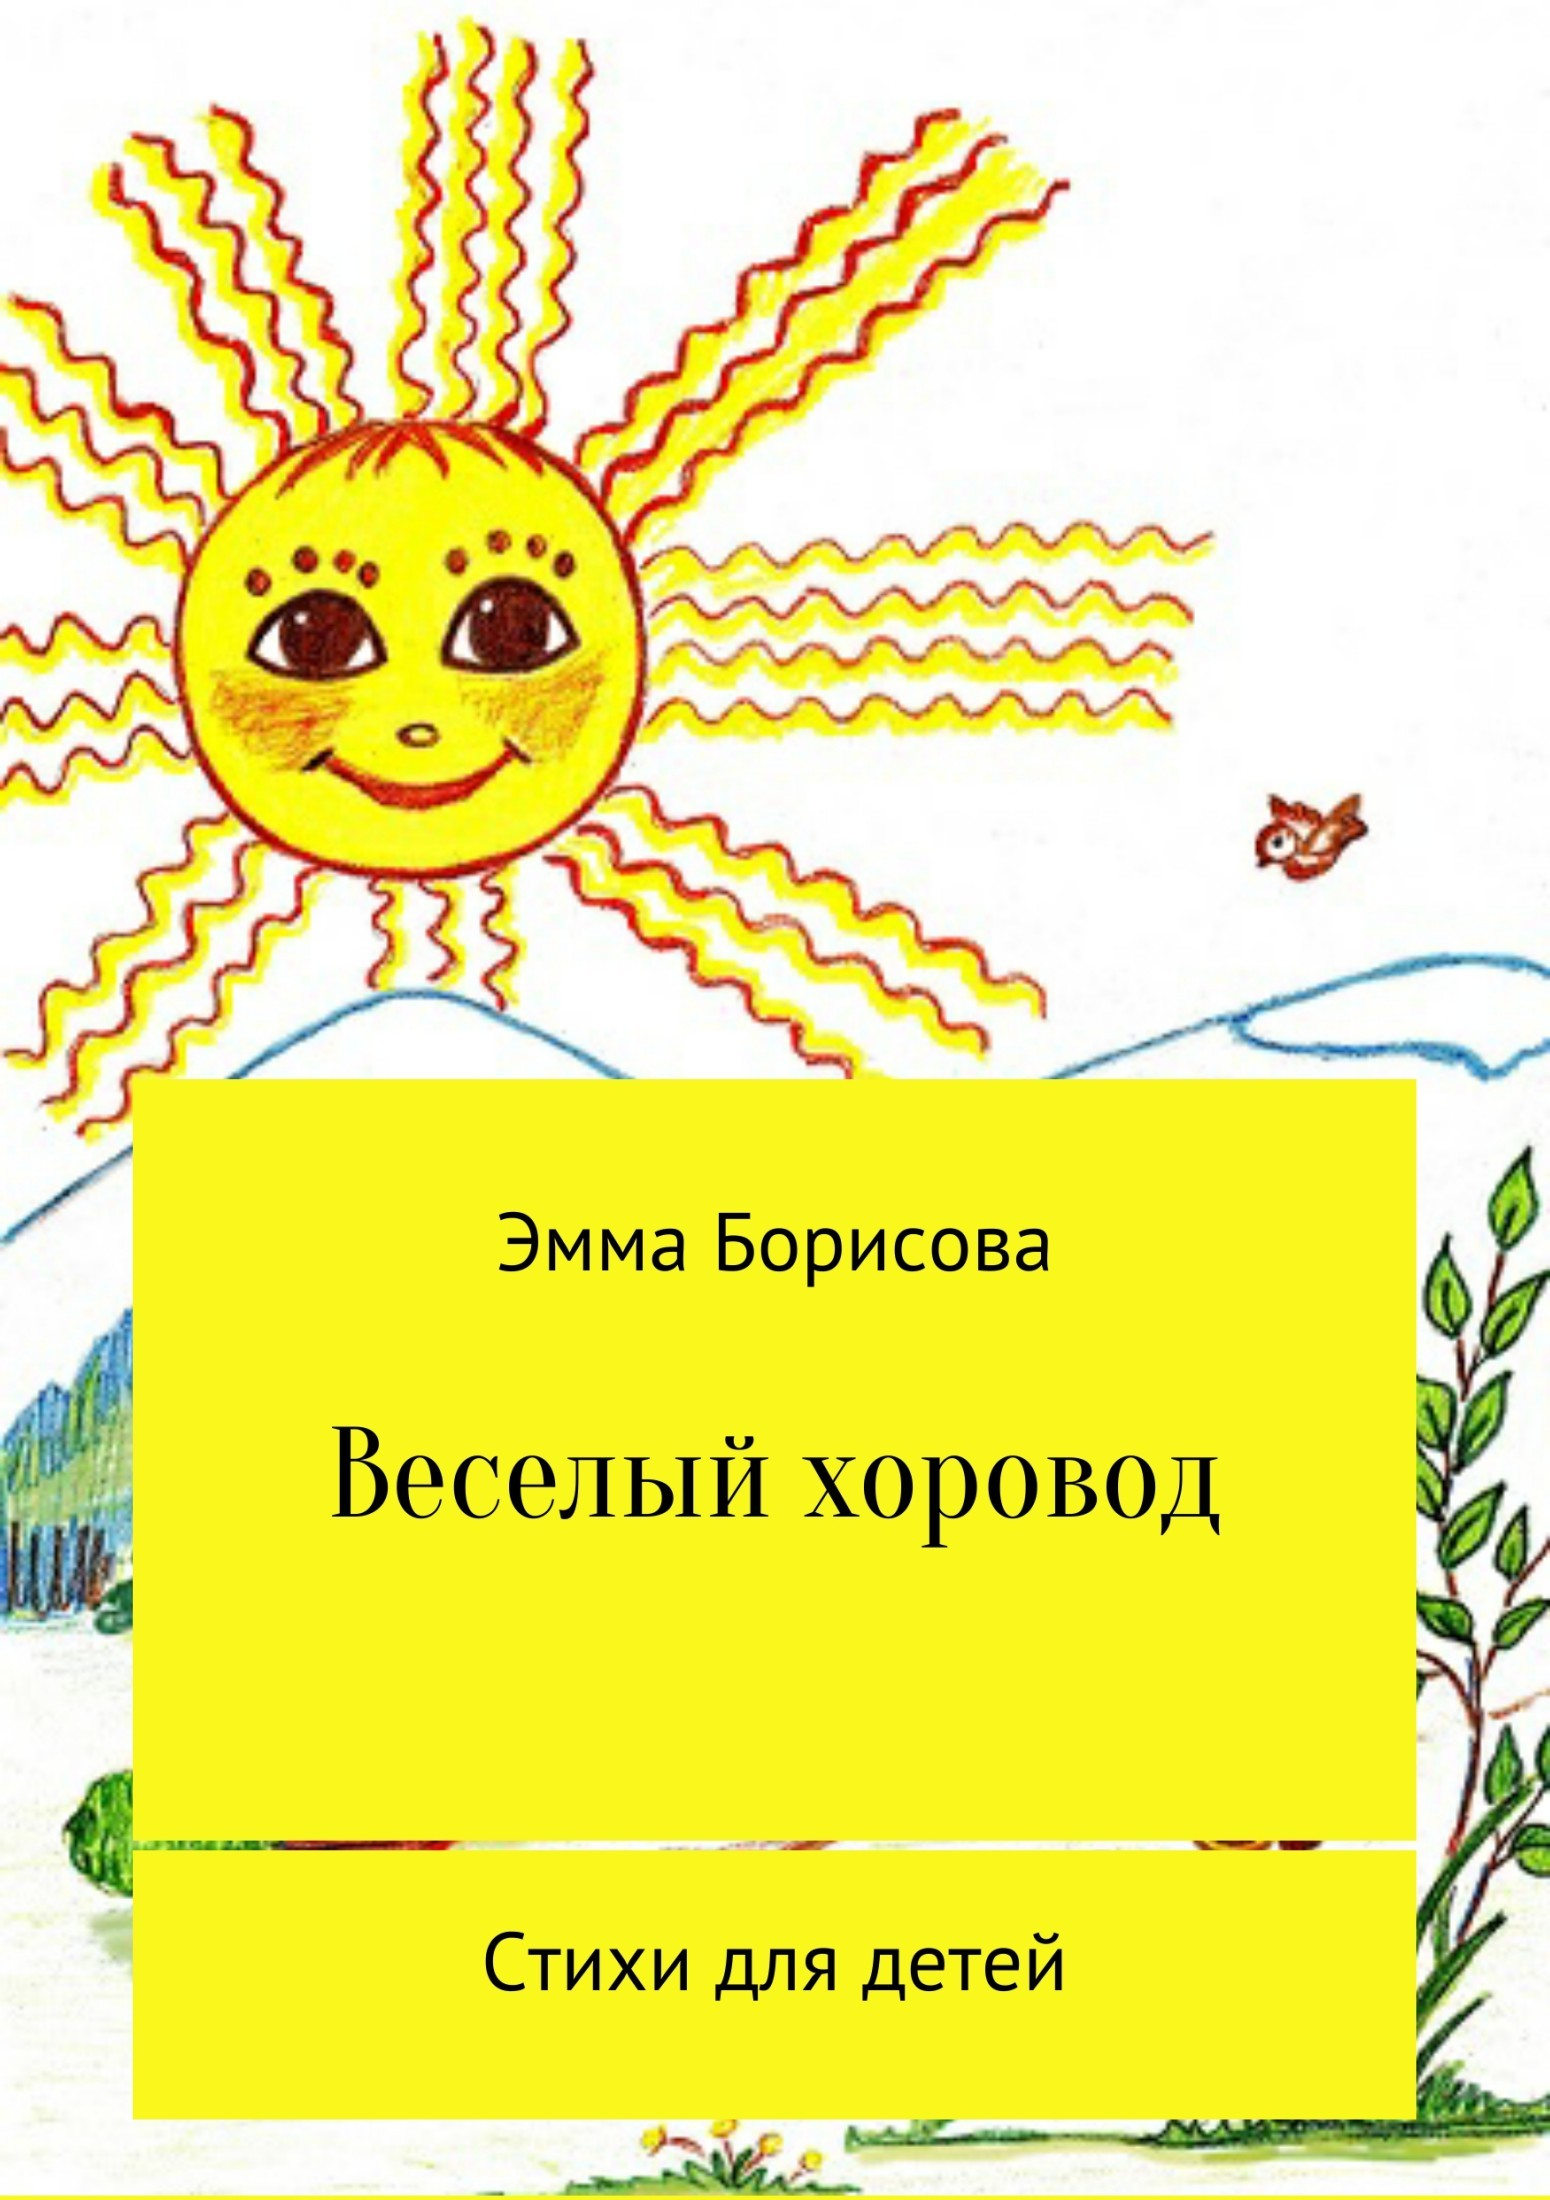 Эмма Борисова - Веселый хоровод